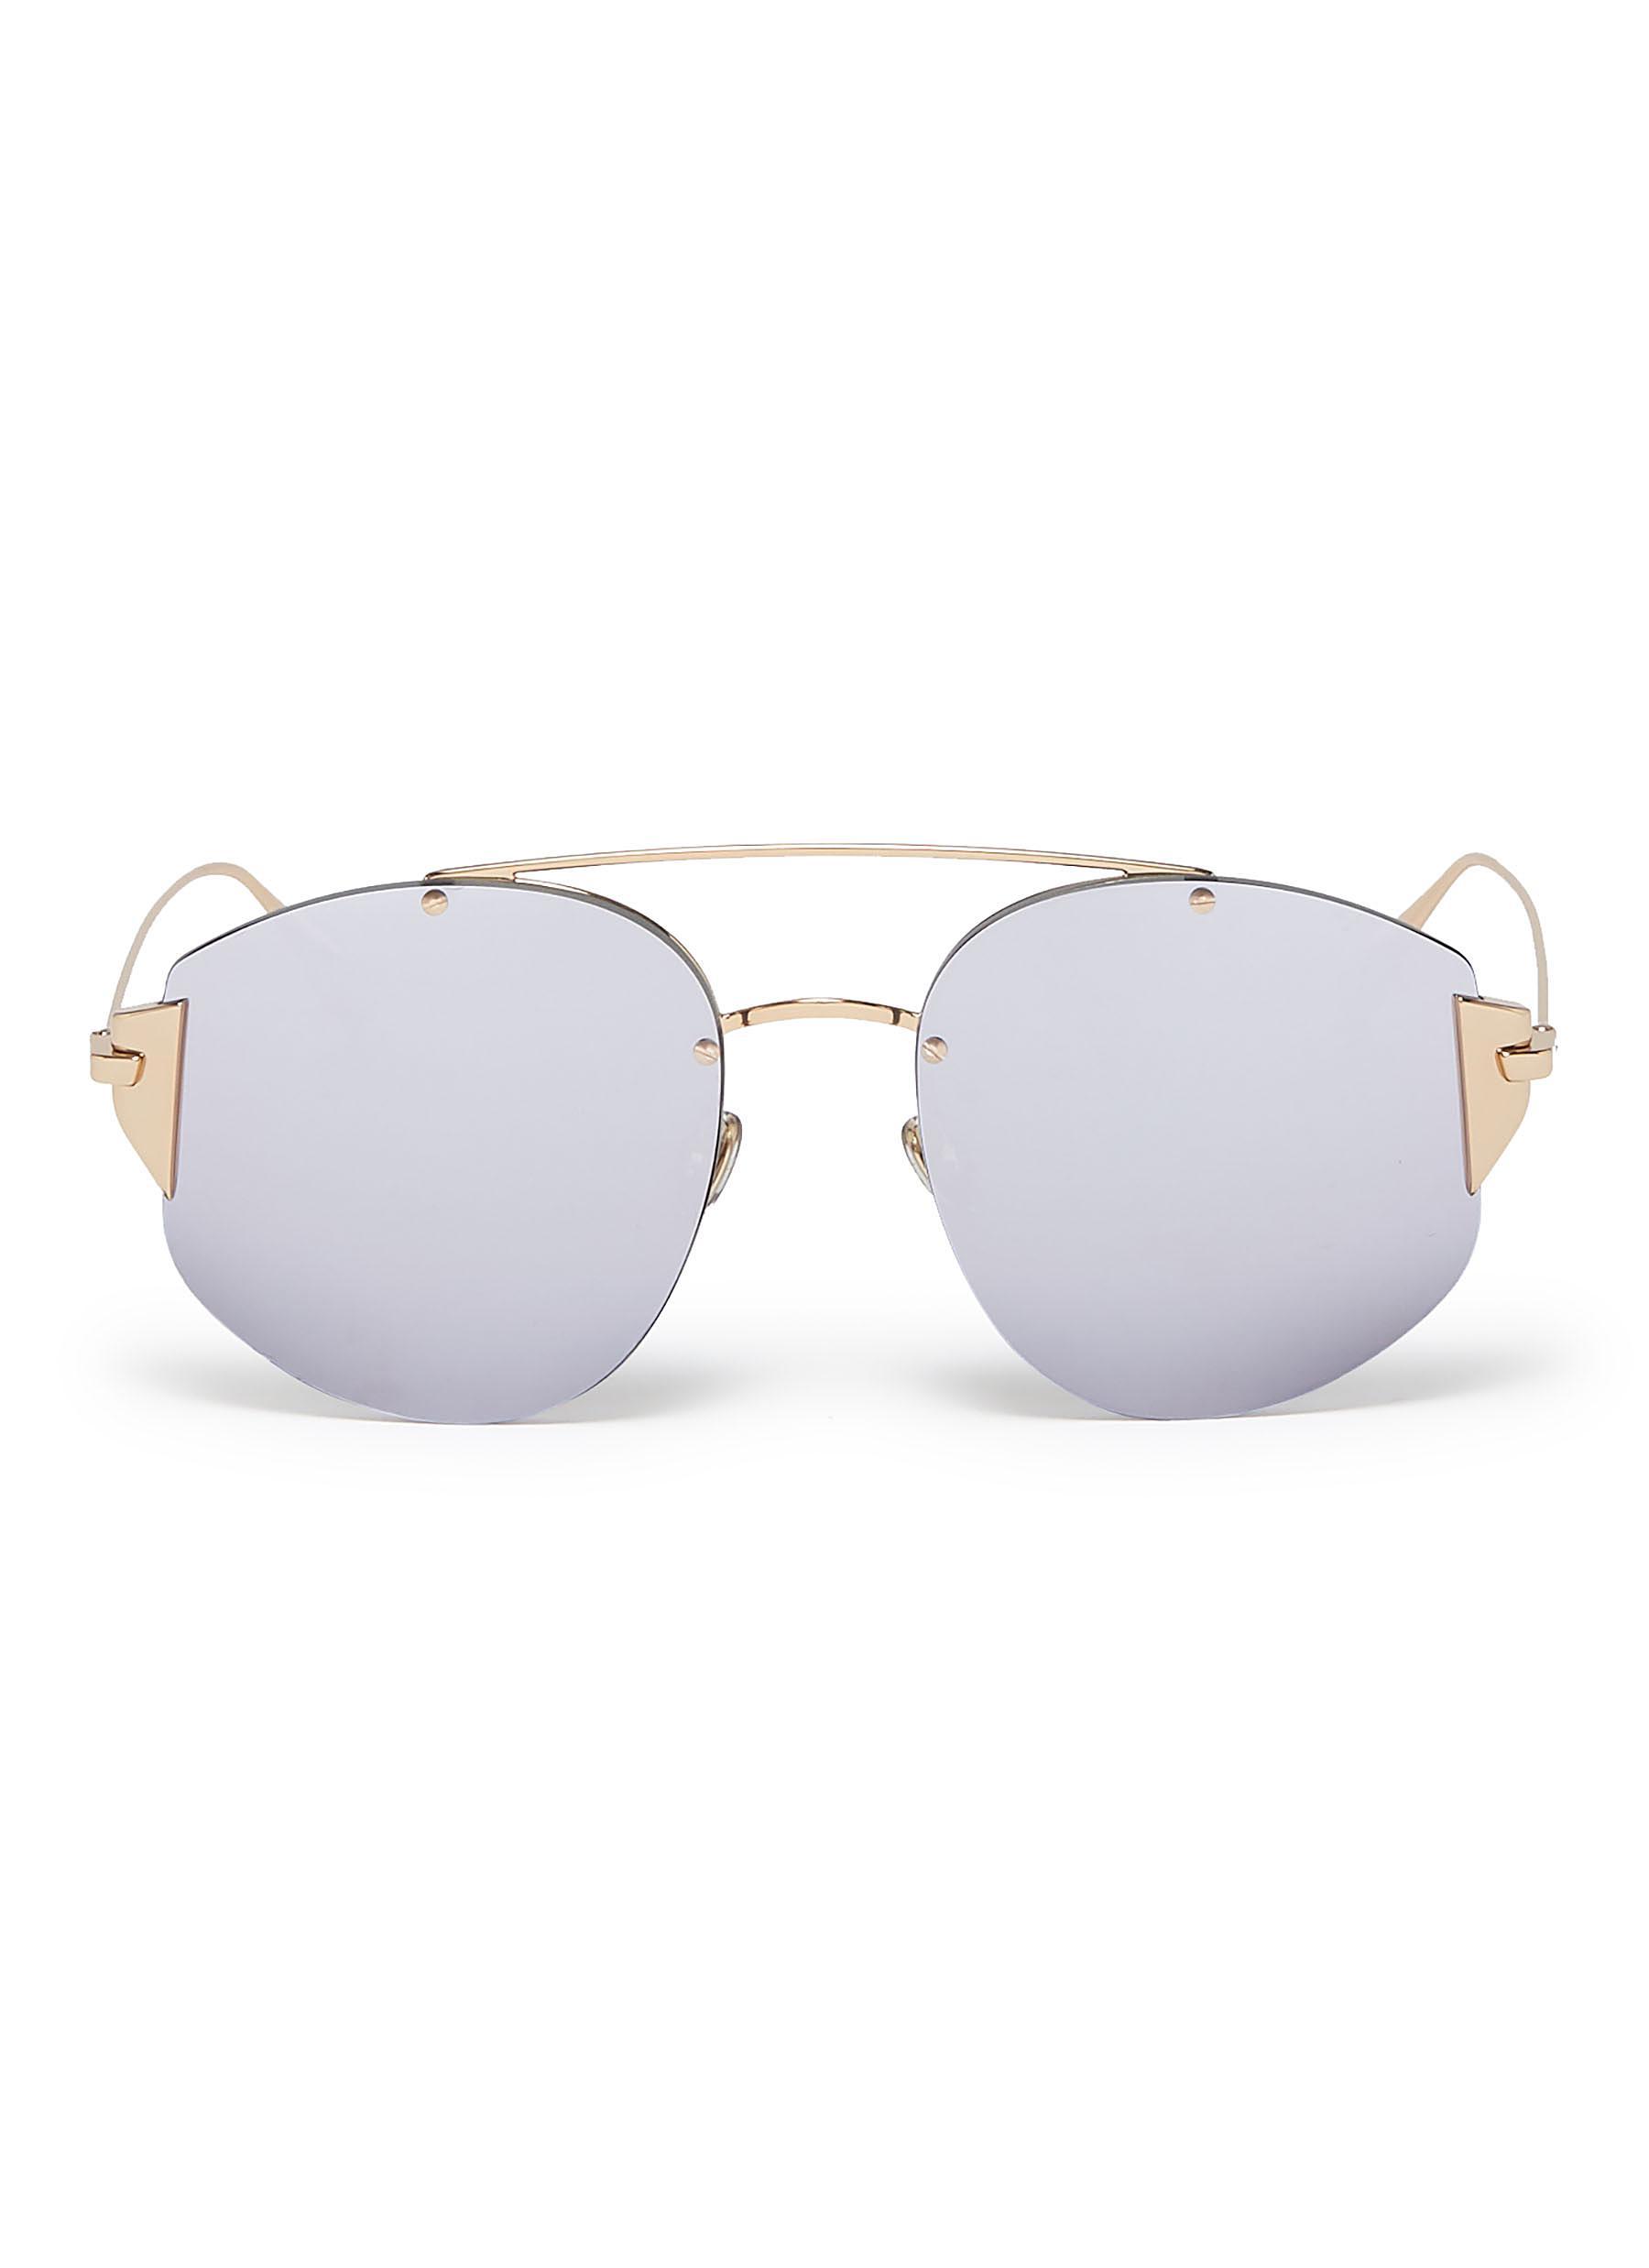 10c5004f9db4 Dior.  Dior Stronger  mirror metal aviator sunglasses